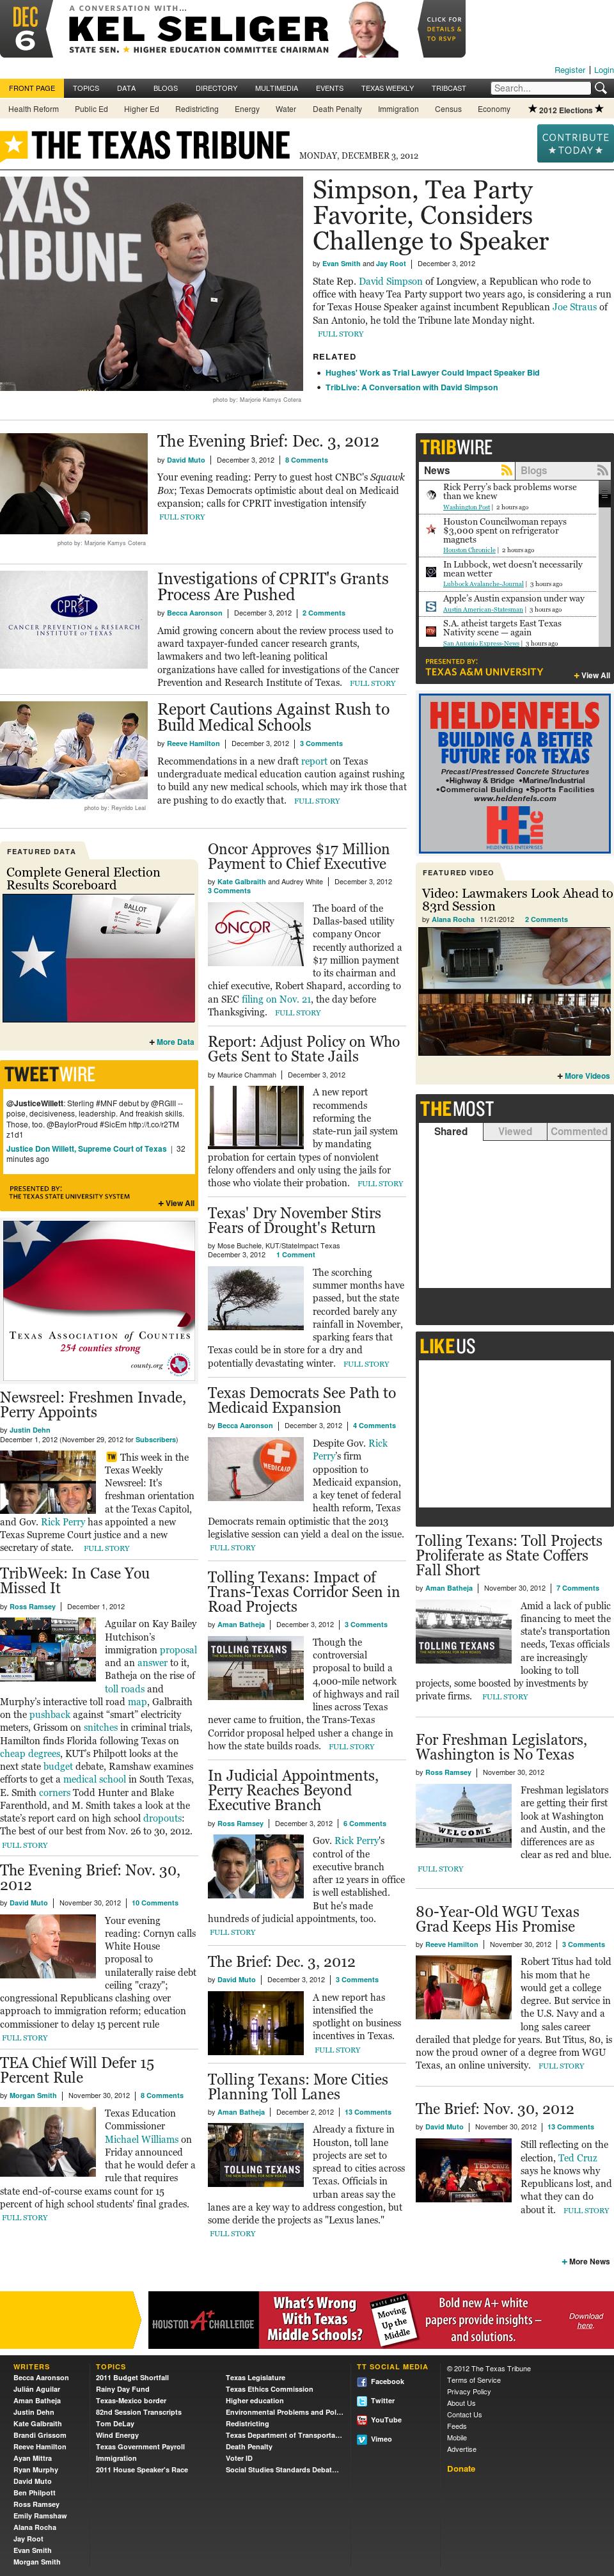 The Texas Tribune at Tuesday Dec. 4, 2012, 5:38 a.m. UTC